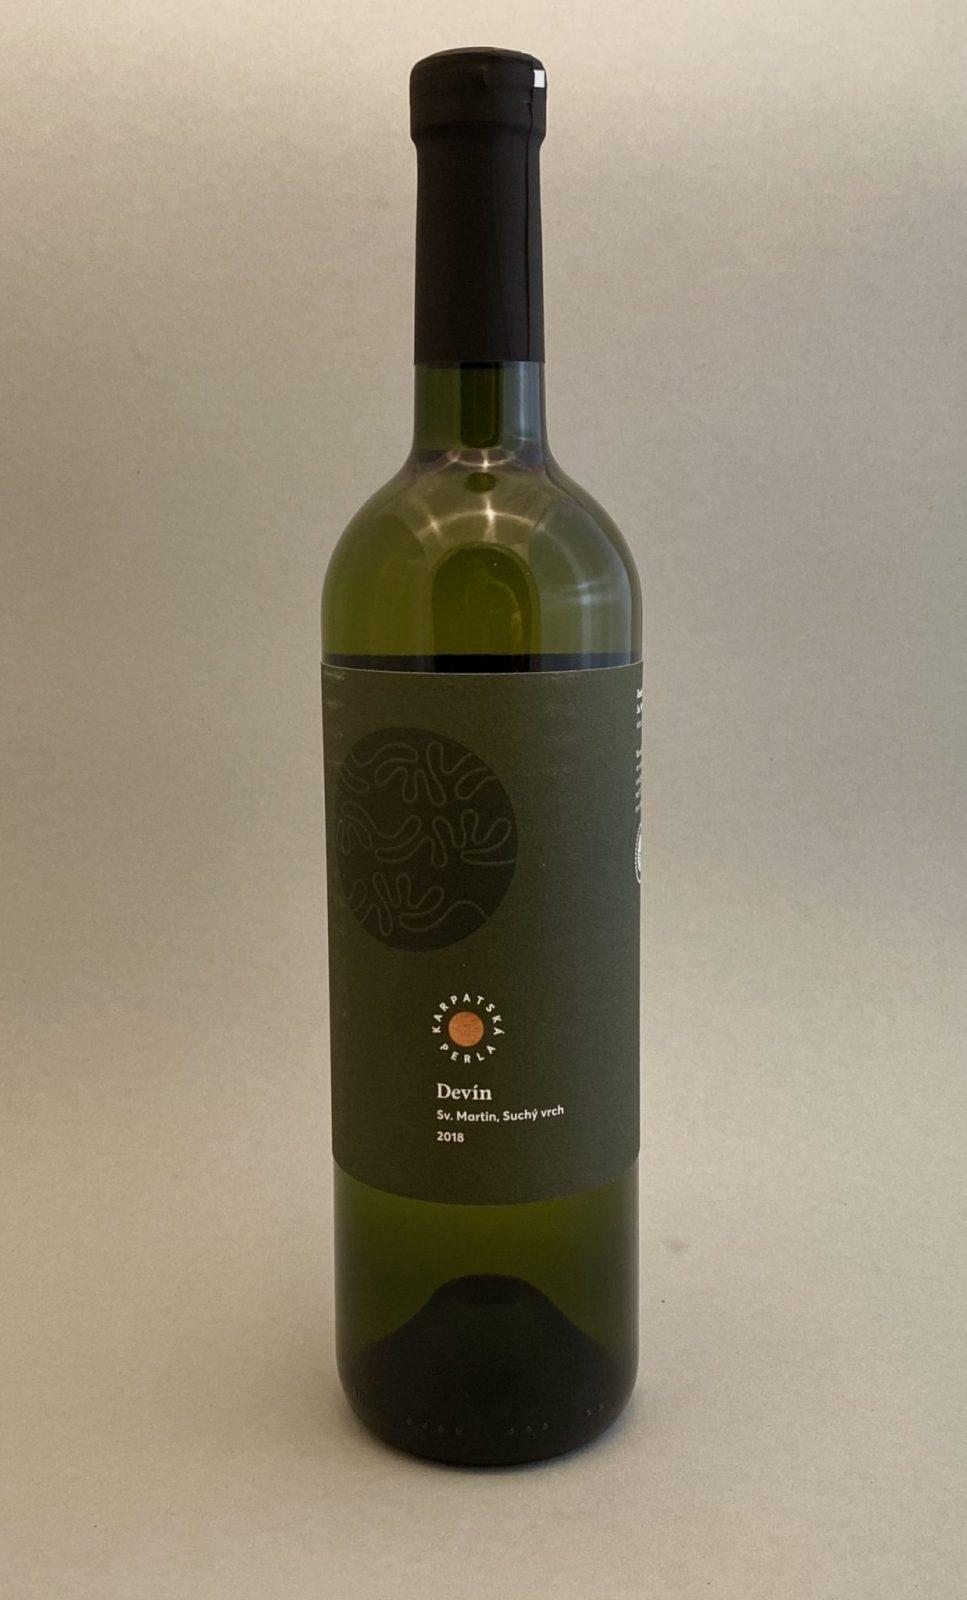 KARPATSKÁ PERLA Devín 2018, vinotéka v Slnečniciach, slovenské biele víno, Bratislava Petržalka, Sunny Wines